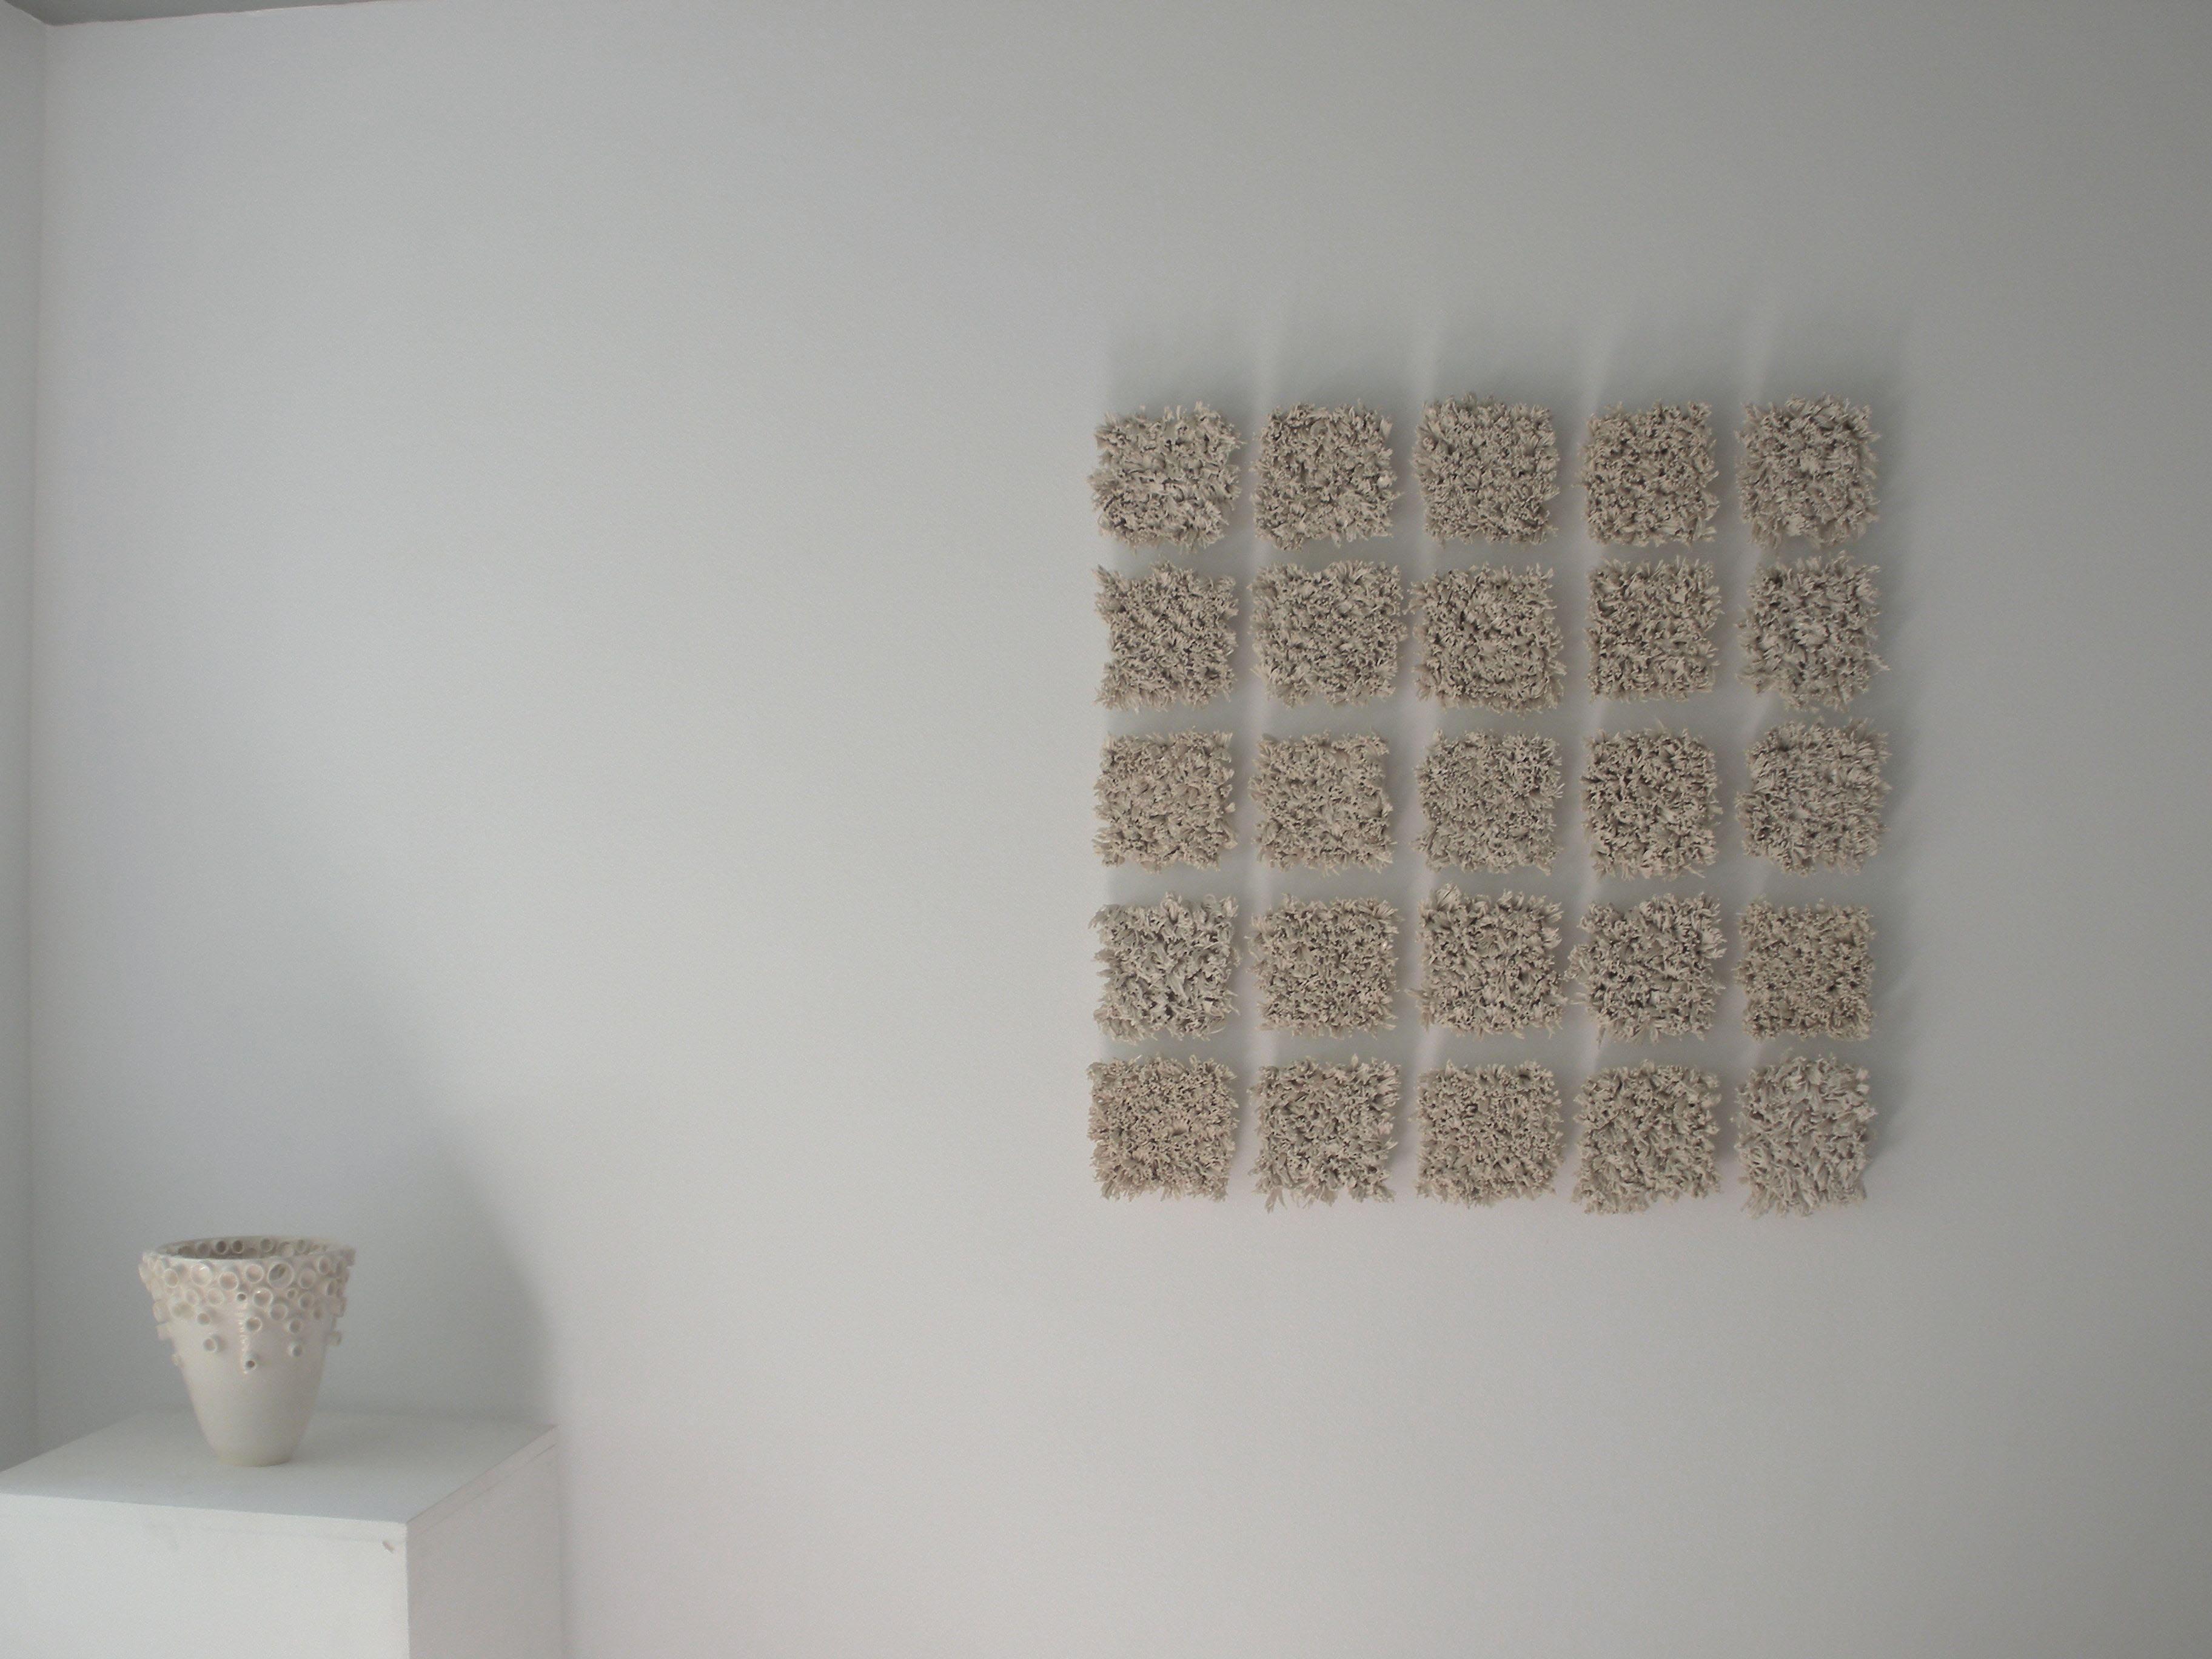 BLOOM, Ceramic Tile Wall Installation on Behance